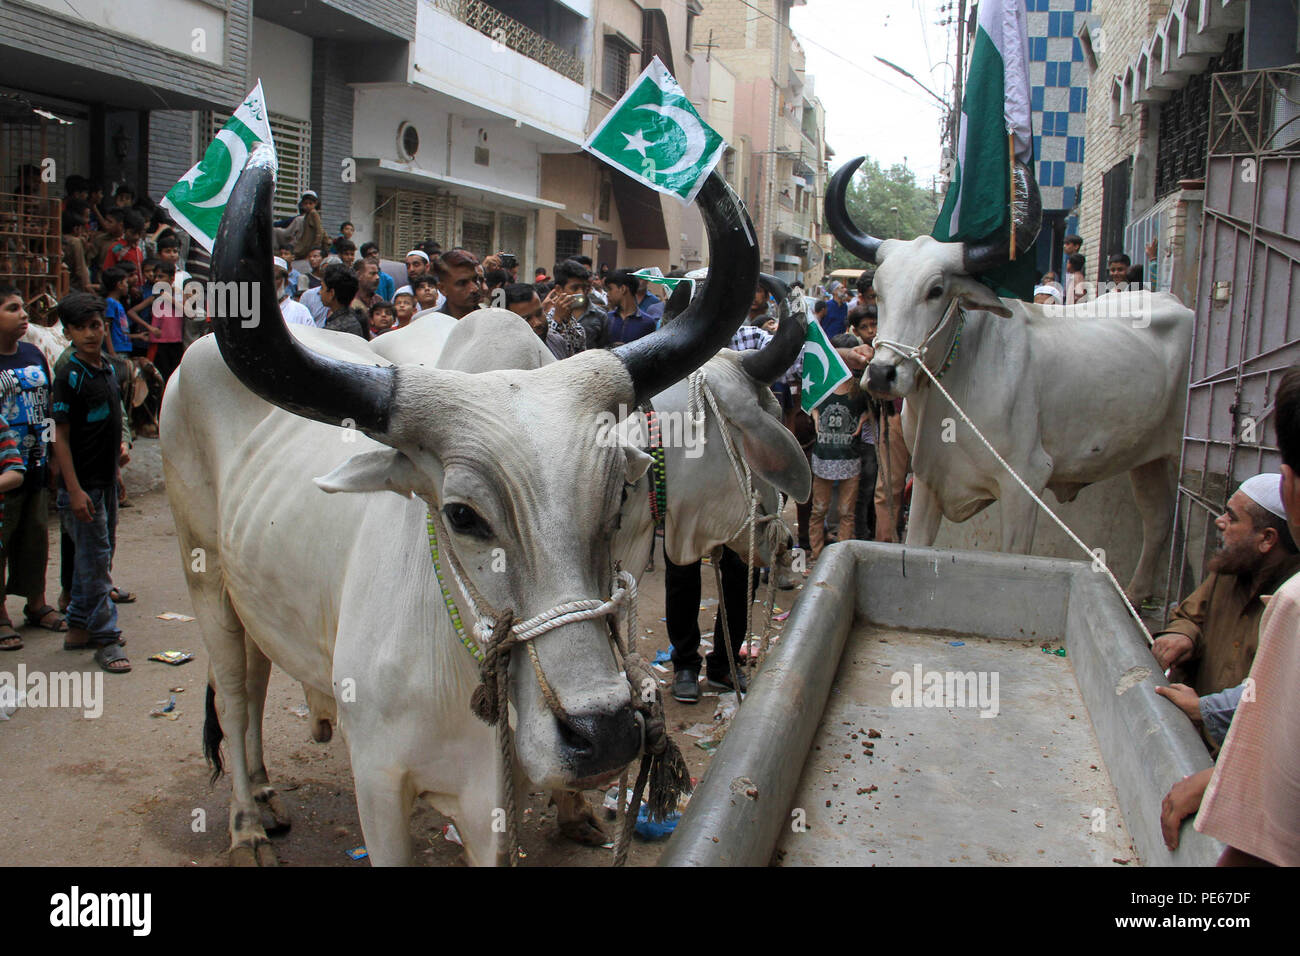 Karachi Vendor Stock Photos & Karachi Vendor Stock Images